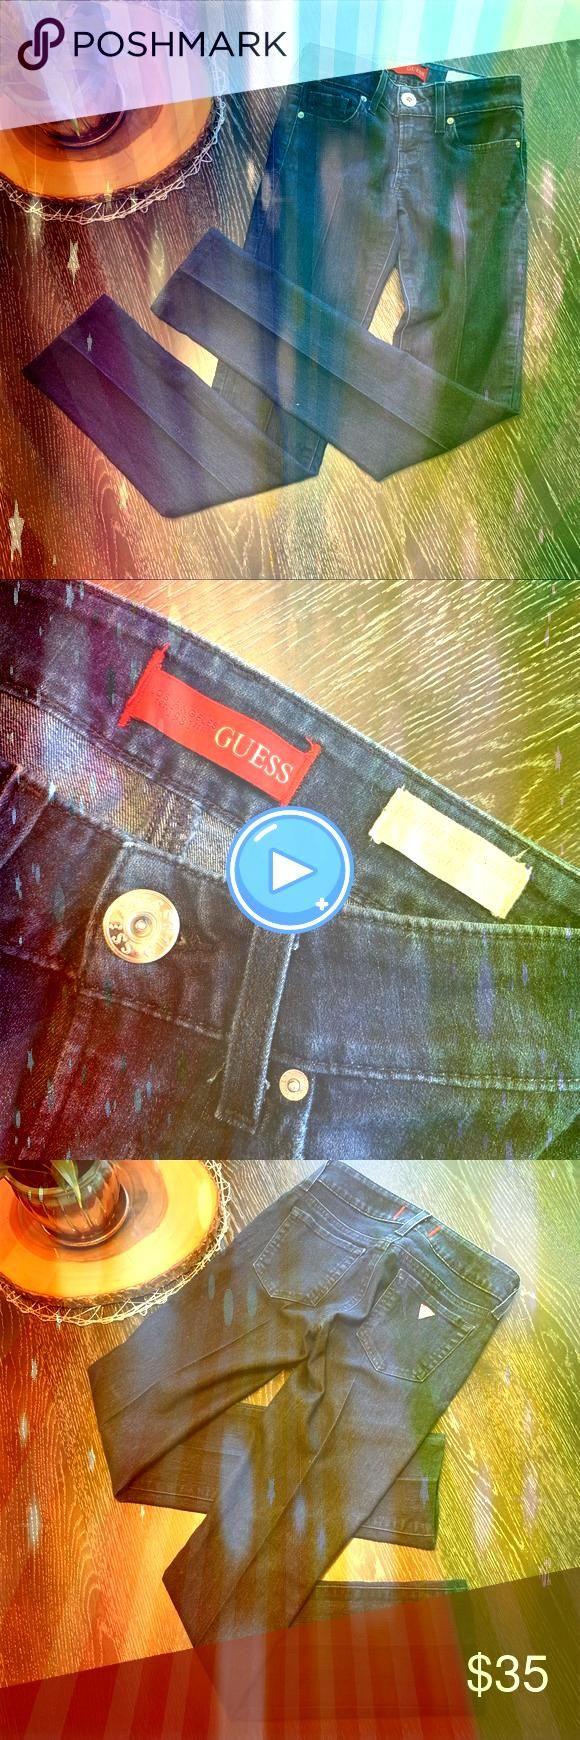 A$AP Rocky x #GUESSOriginals Collection Drops Feb 16th on